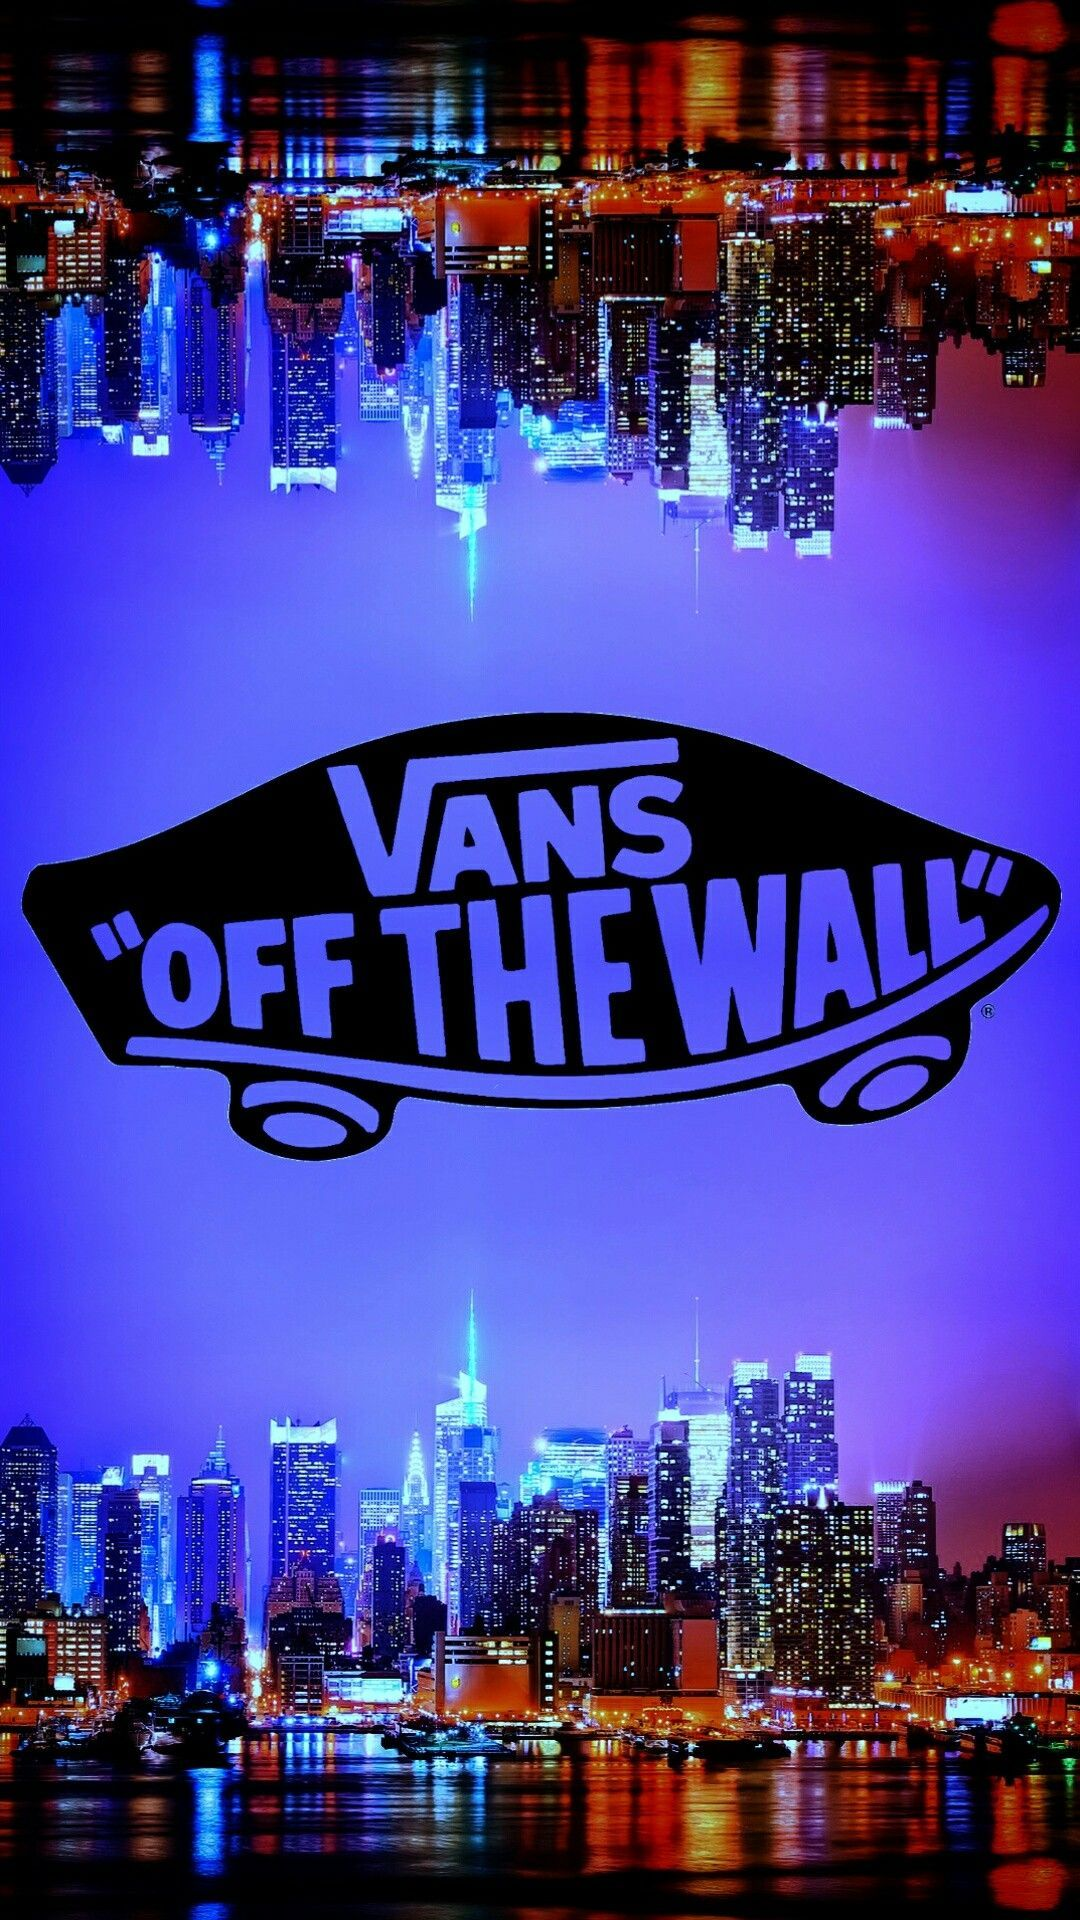 Get Best Vans Wallpaper for Smartphones This Month by